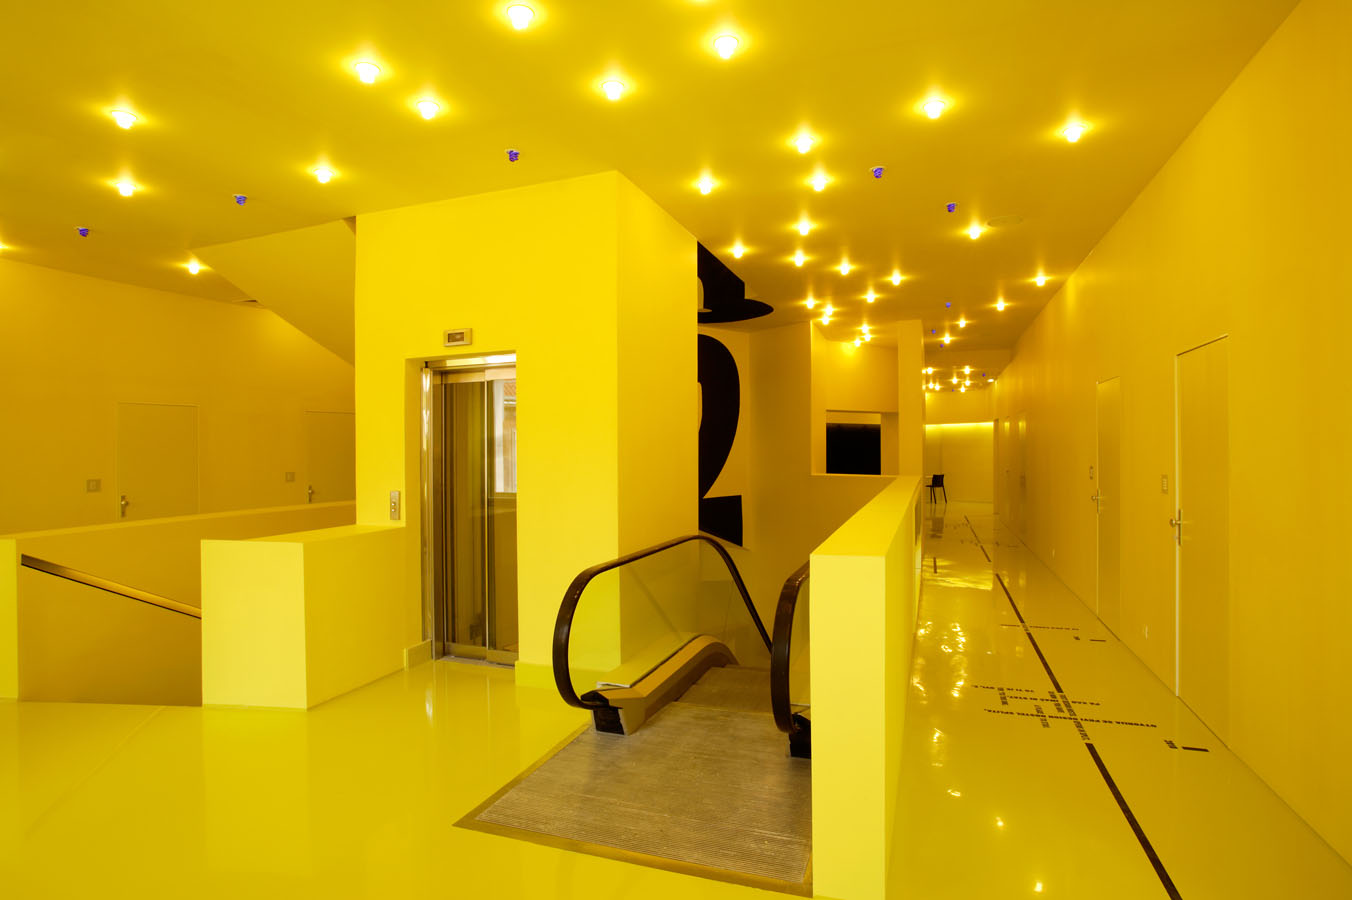 hostel golly bossy by studio up 8 Hostel Golly±Bossy By Studio Up